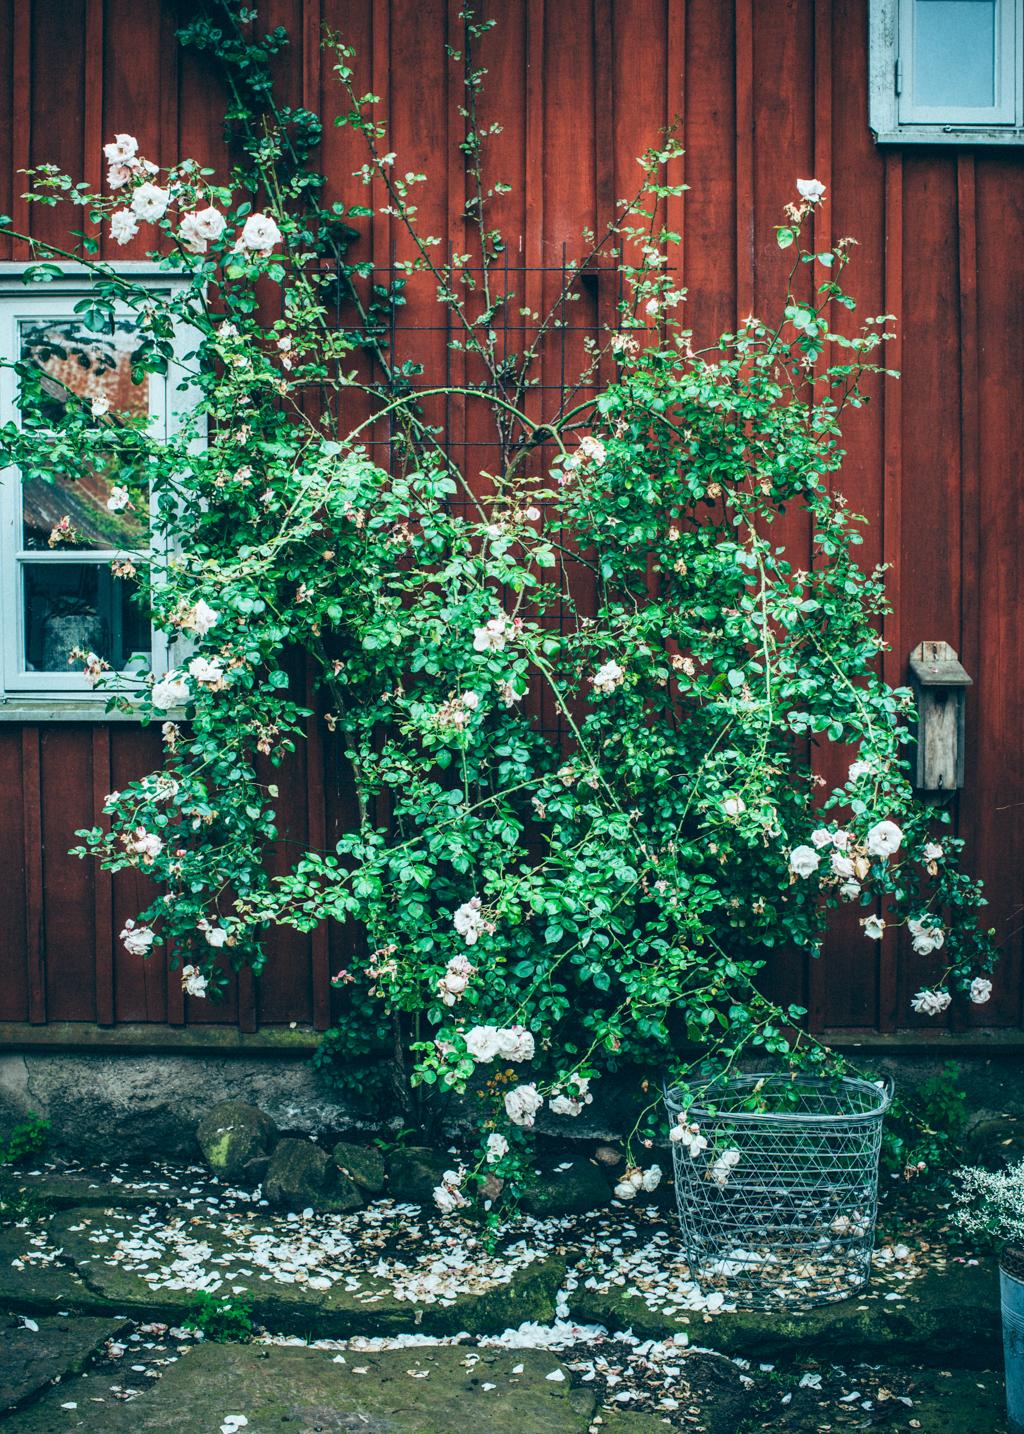 marie2_kristin lagerqvist-8943